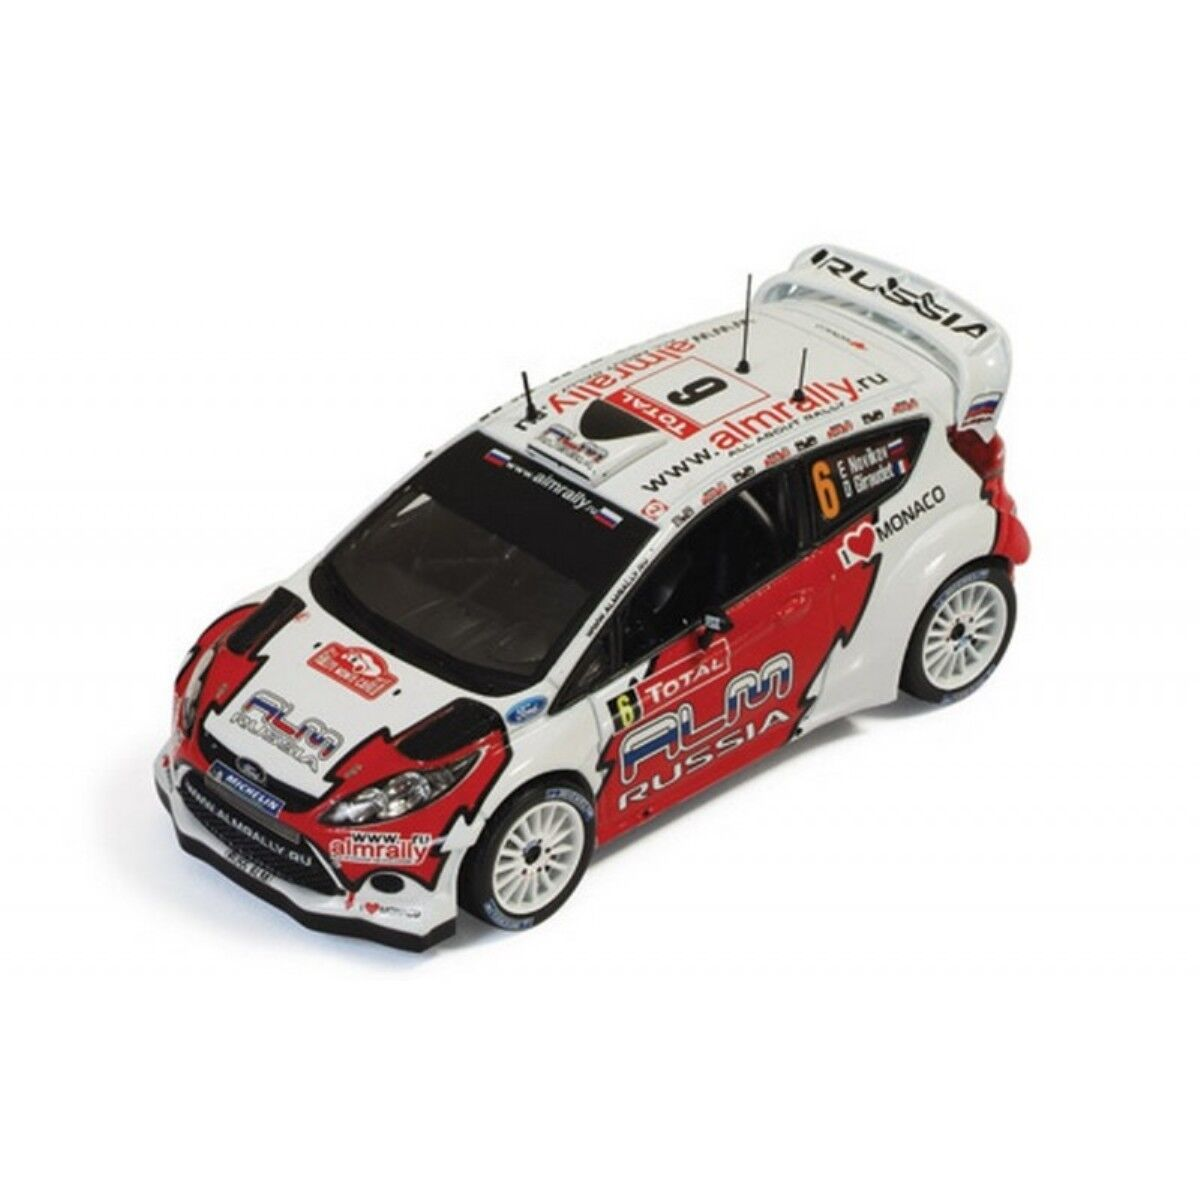 FORD FIESTA RS WRC  6 NOVIKOV GIRAUDET RALLYE MONTE CARLO 2012 IXO RAM494 1 43